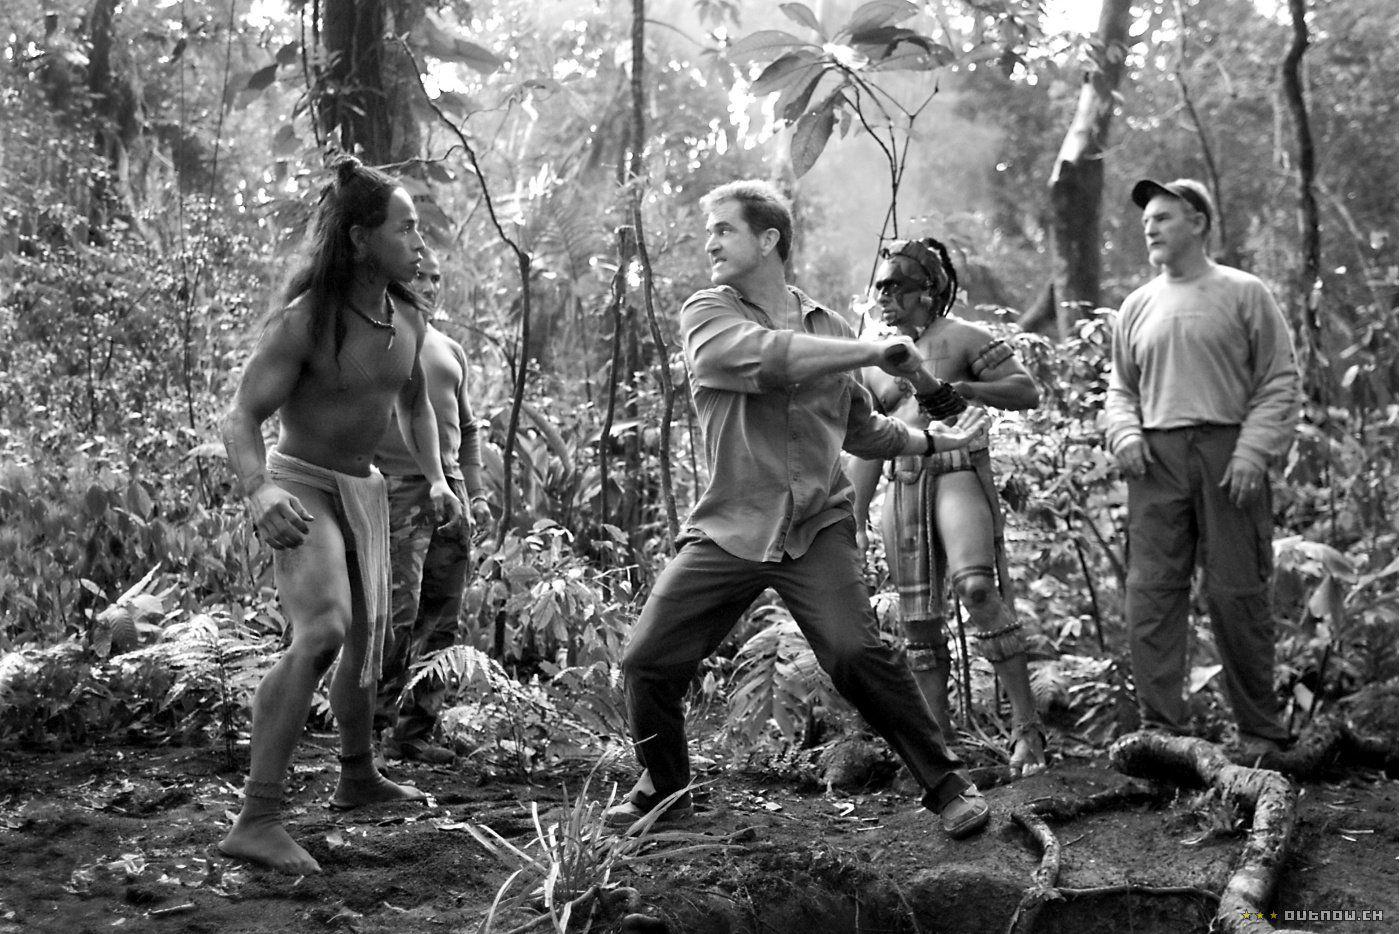 Director Mel Gibson on the set of Apocalypto (2006